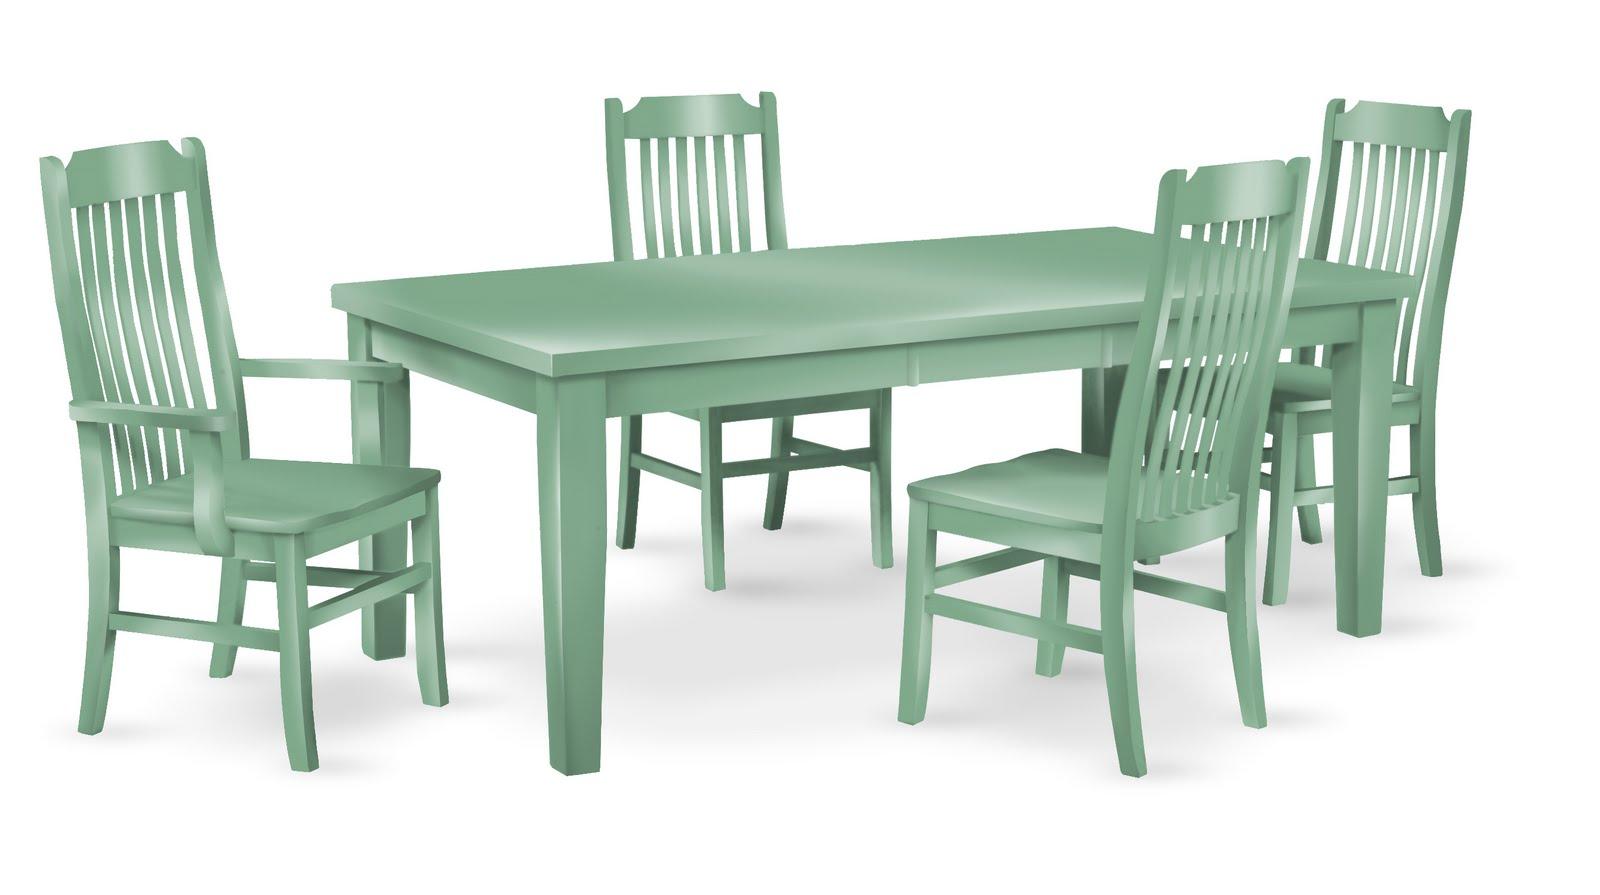 Tisbury Dining Table